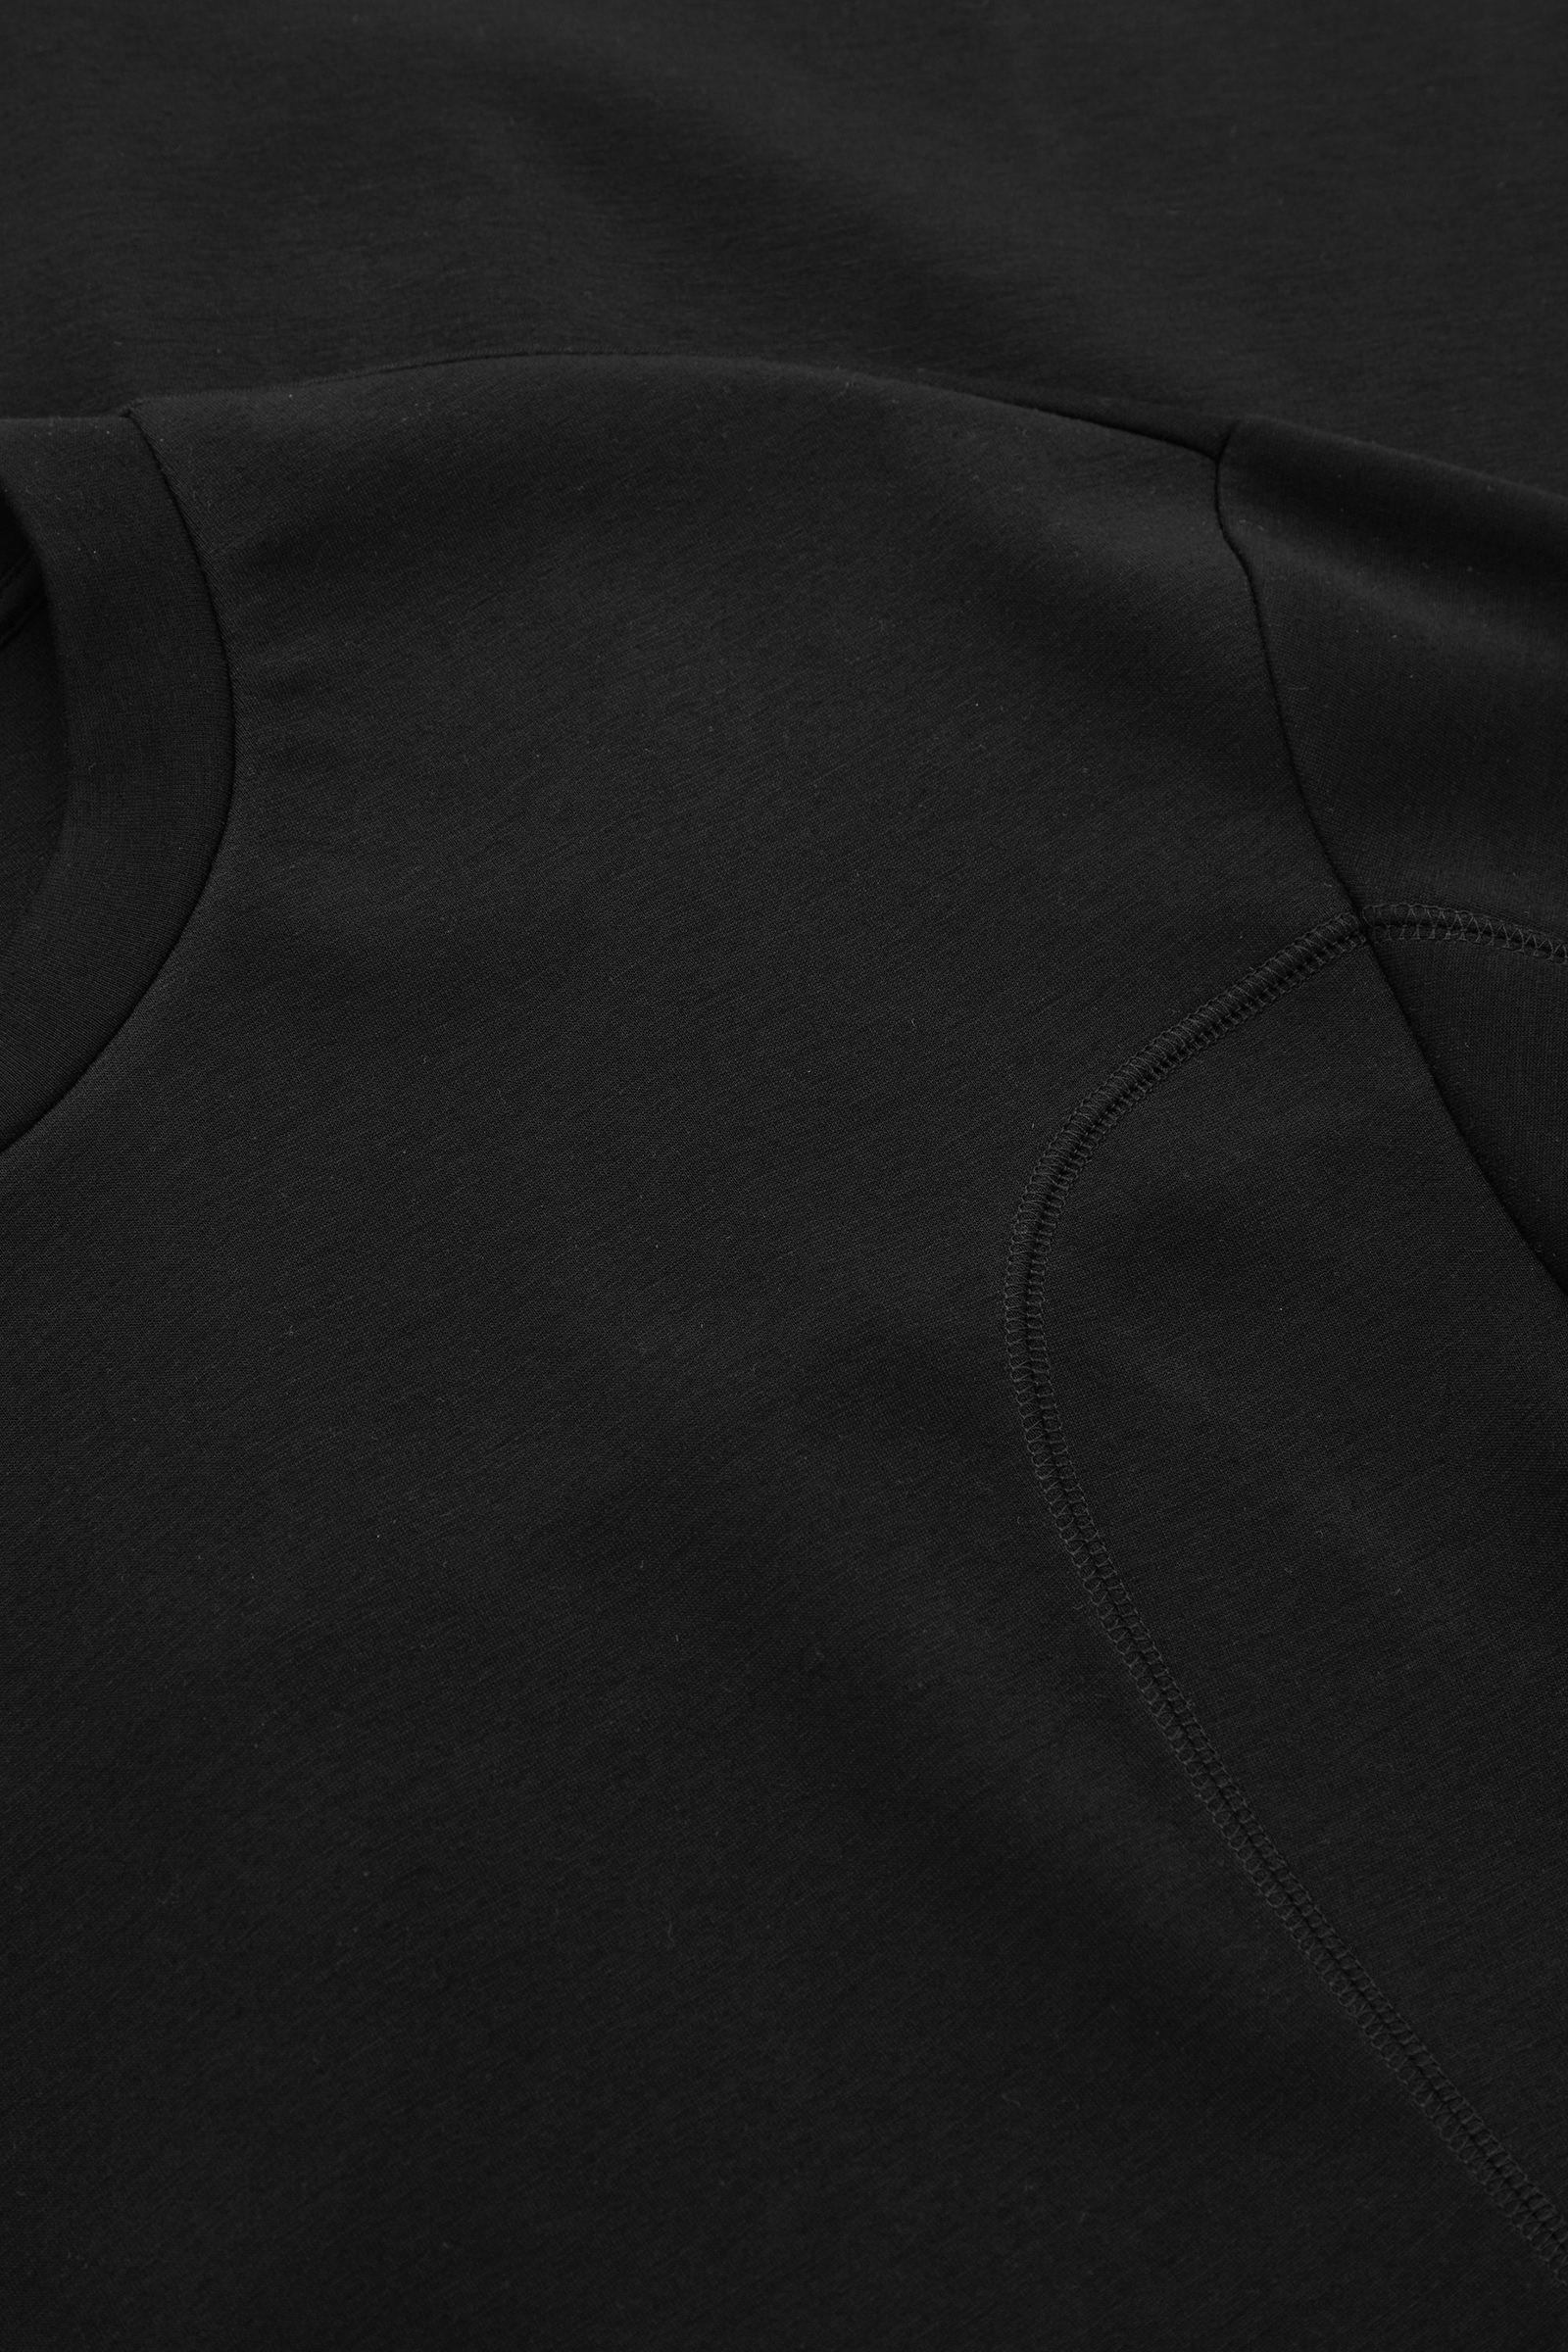 COS 테크니컬 커브드 패널 스웻셔츠 드레스의 블랙컬러 Detail입니다.